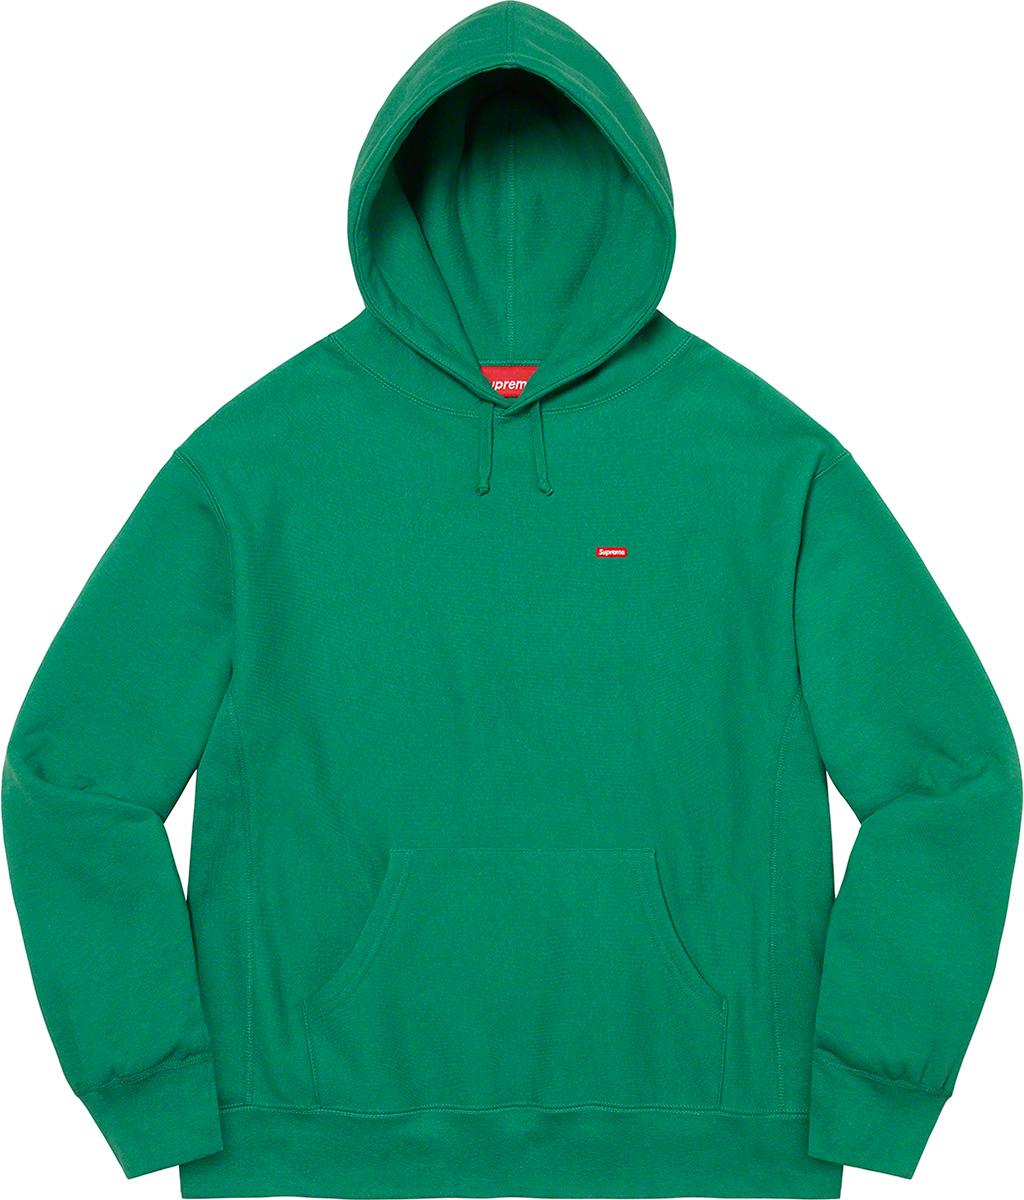 supreme-21aw-21fw-small-box-hooded-sweatshirt